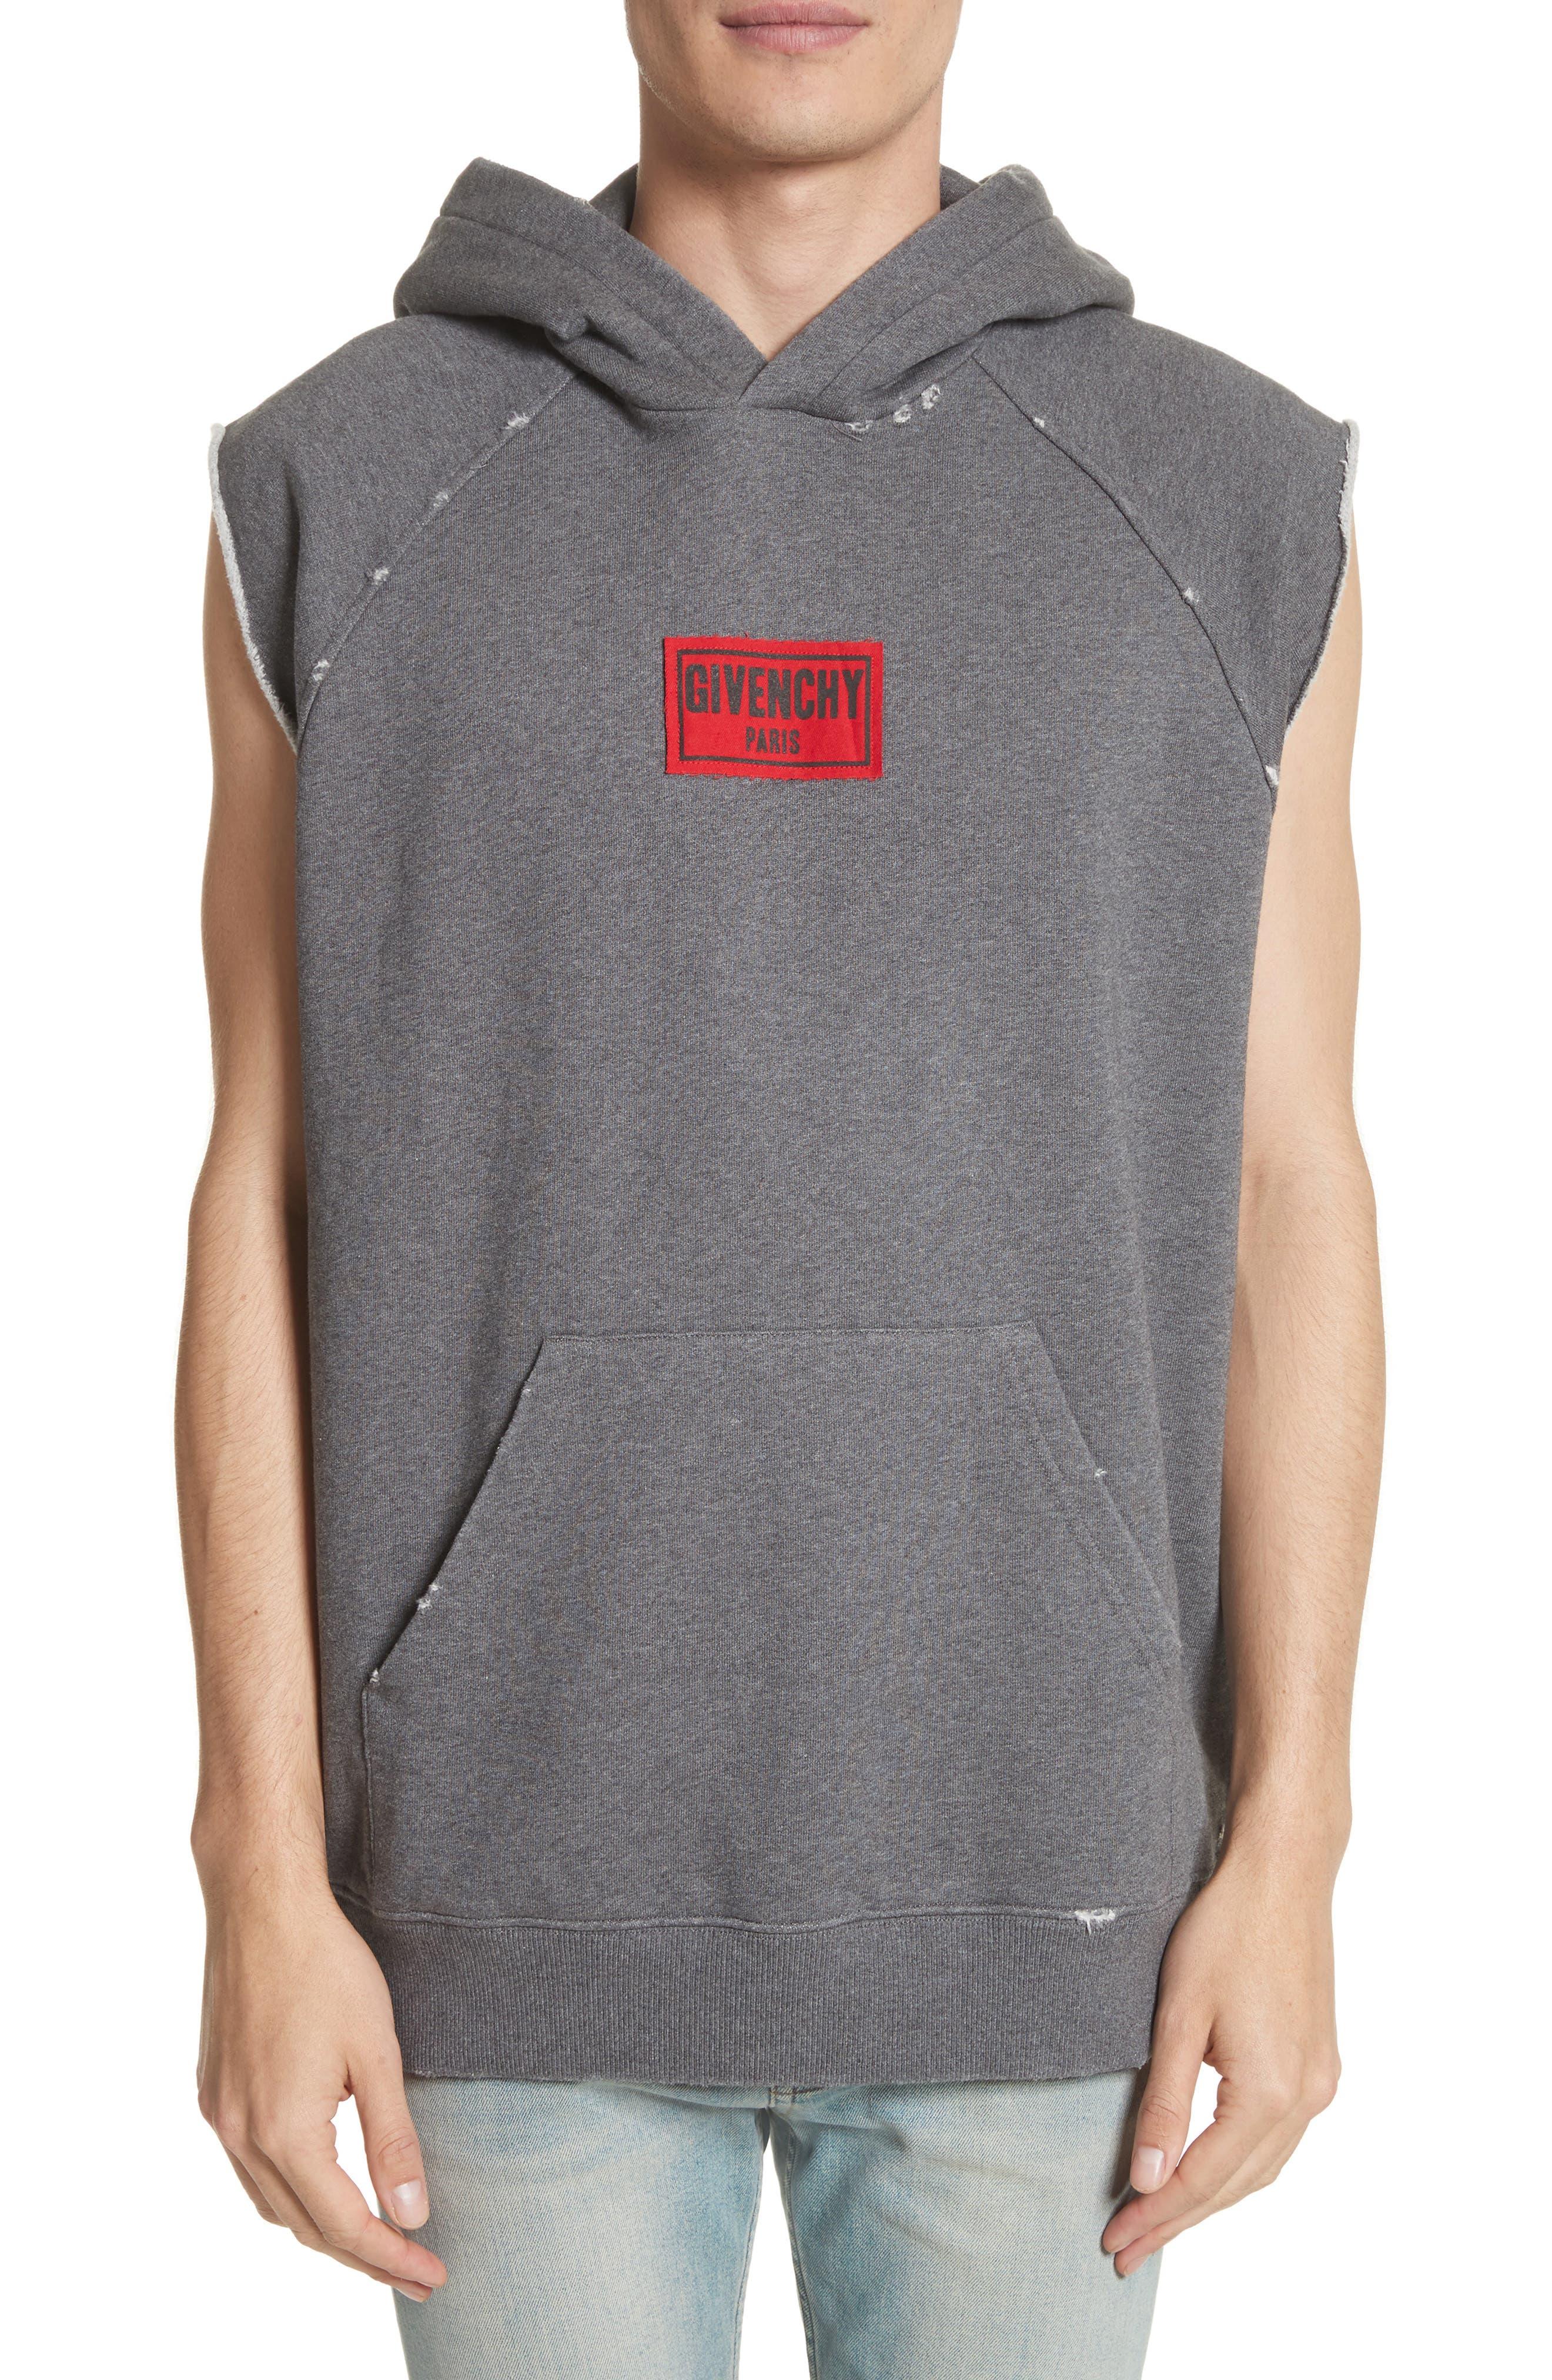 Givenchy Small Logo Sleeveless Hoodie